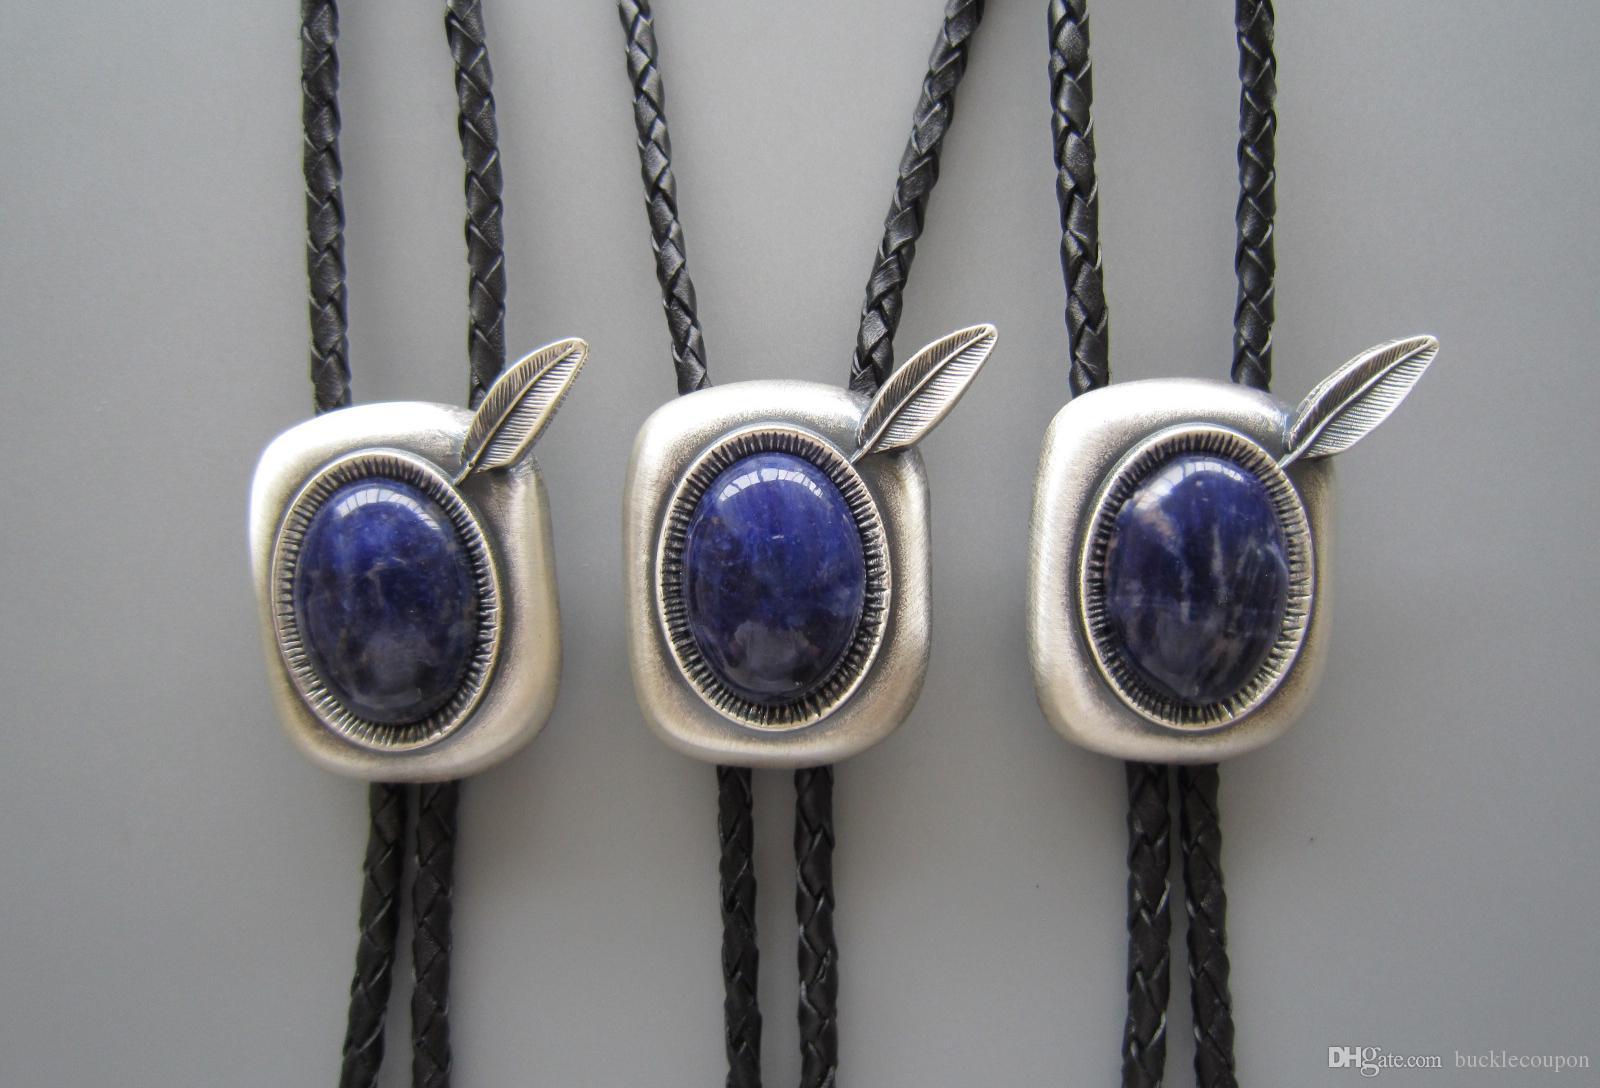 Western Tie Clips لعبة بولو التعادل للرجال من الفضة المطلية باللون الأزرق من plessite Stone